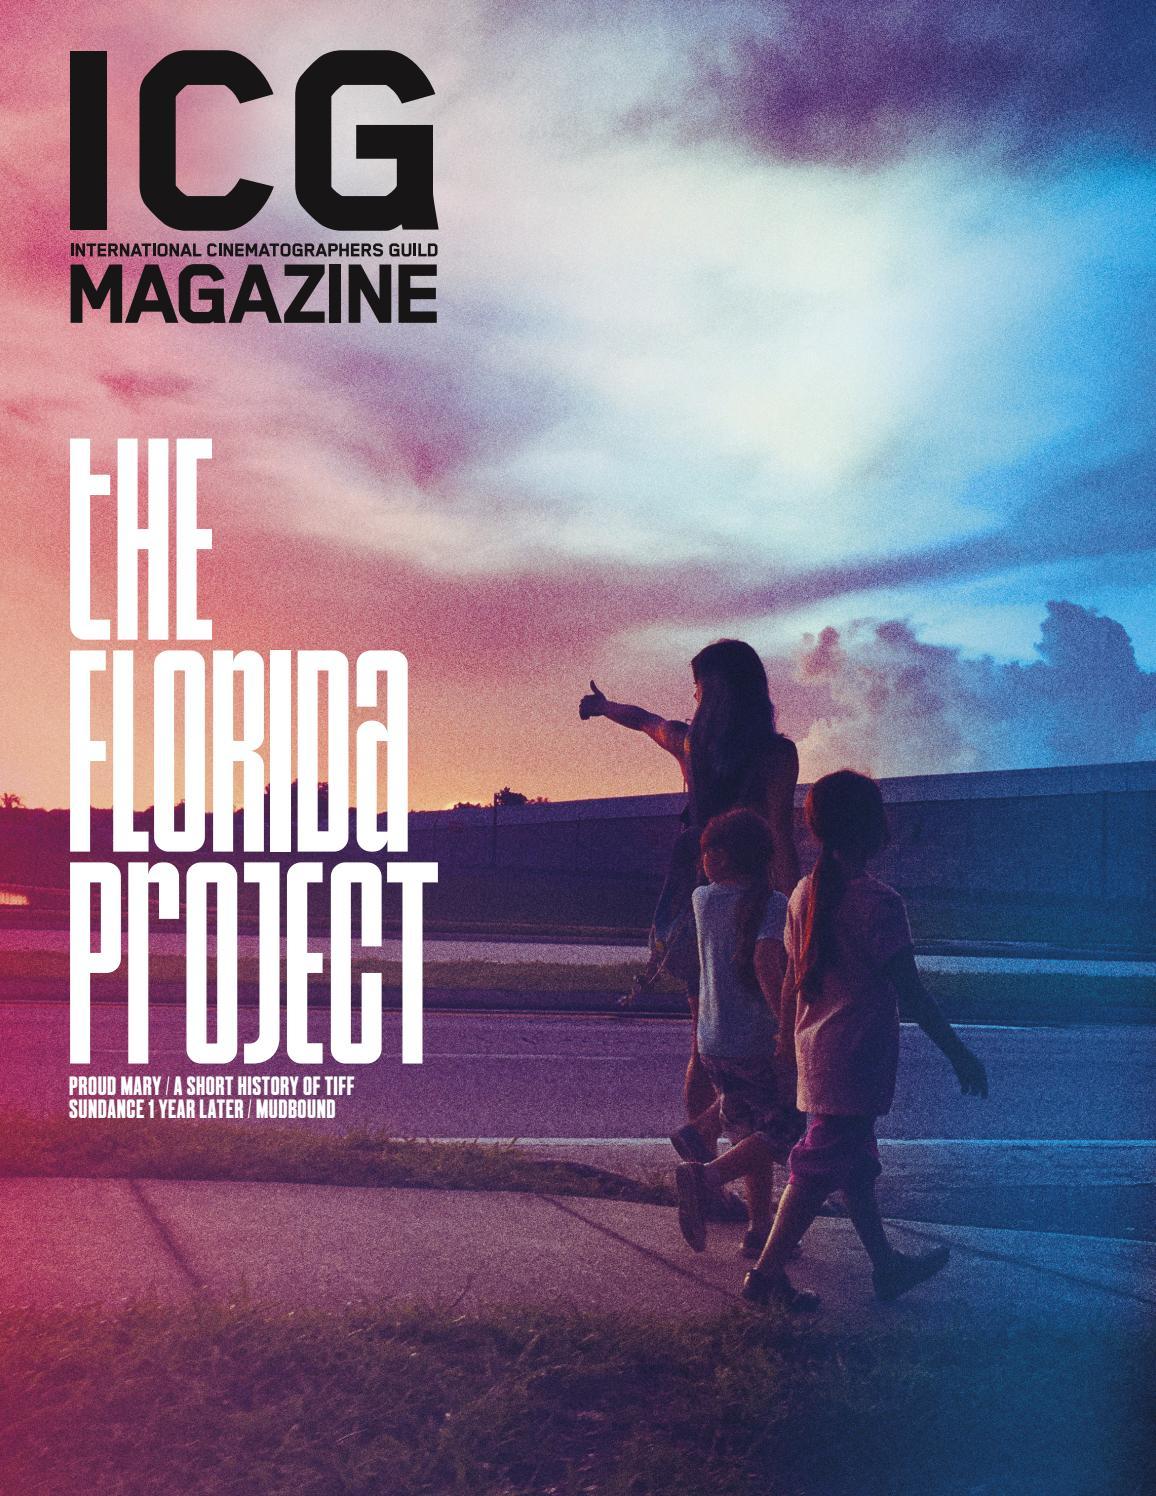 b5380a1dad3 ICG Magazine - January 2018 - Film Festival Issue by ICG Magazine ...